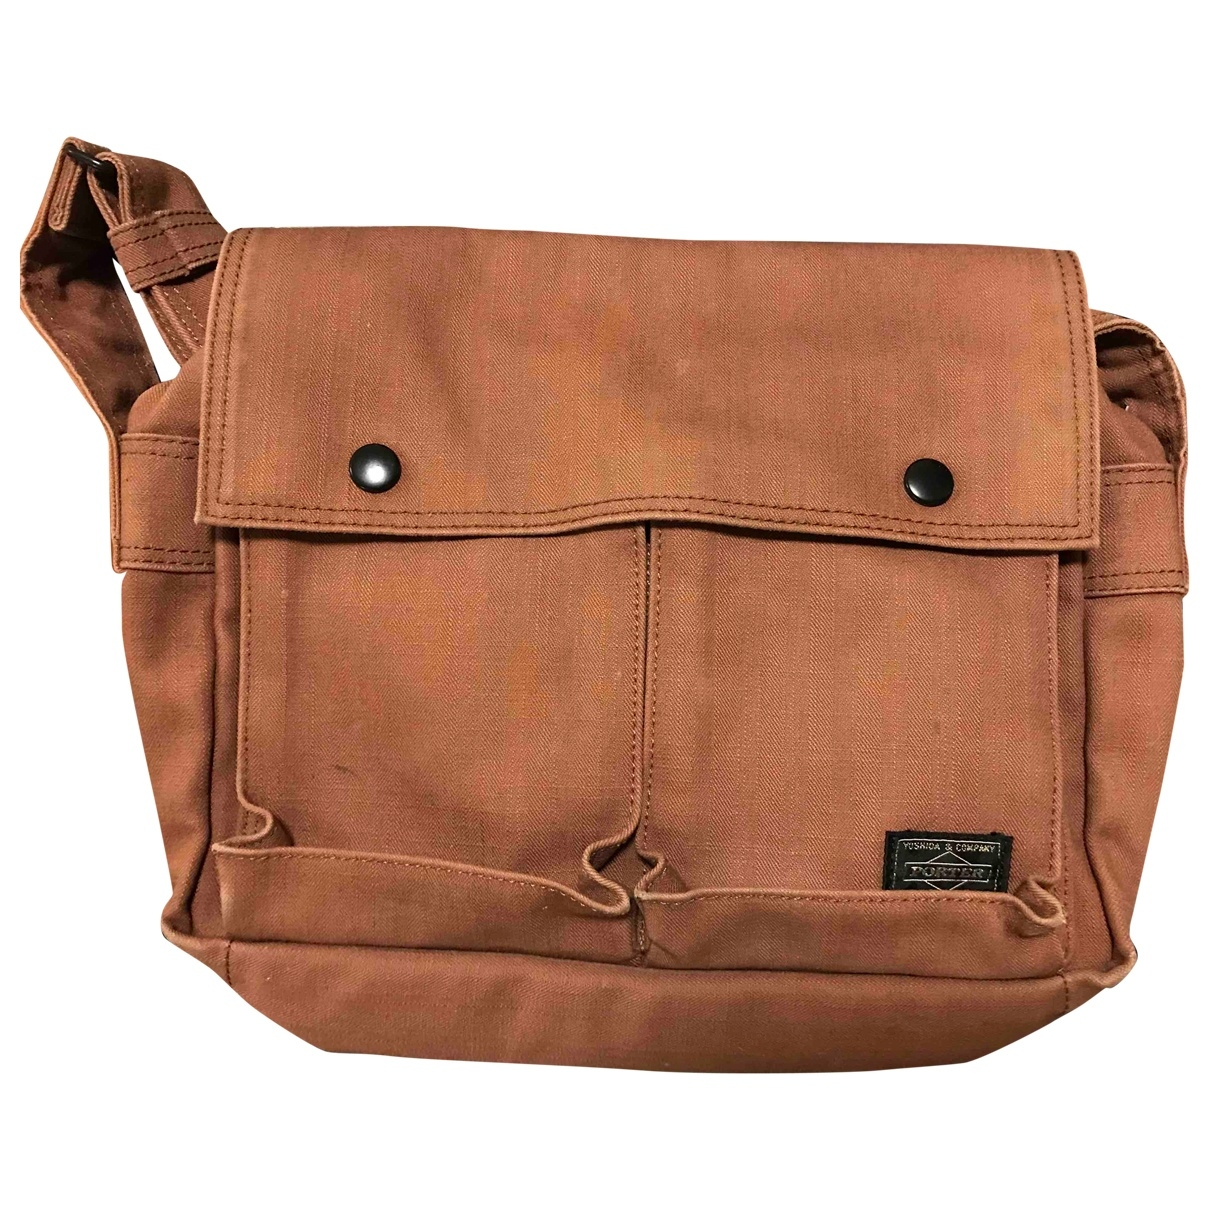 Porter By Yoshida Kaban \N Brown Cotton handbag for Women \N